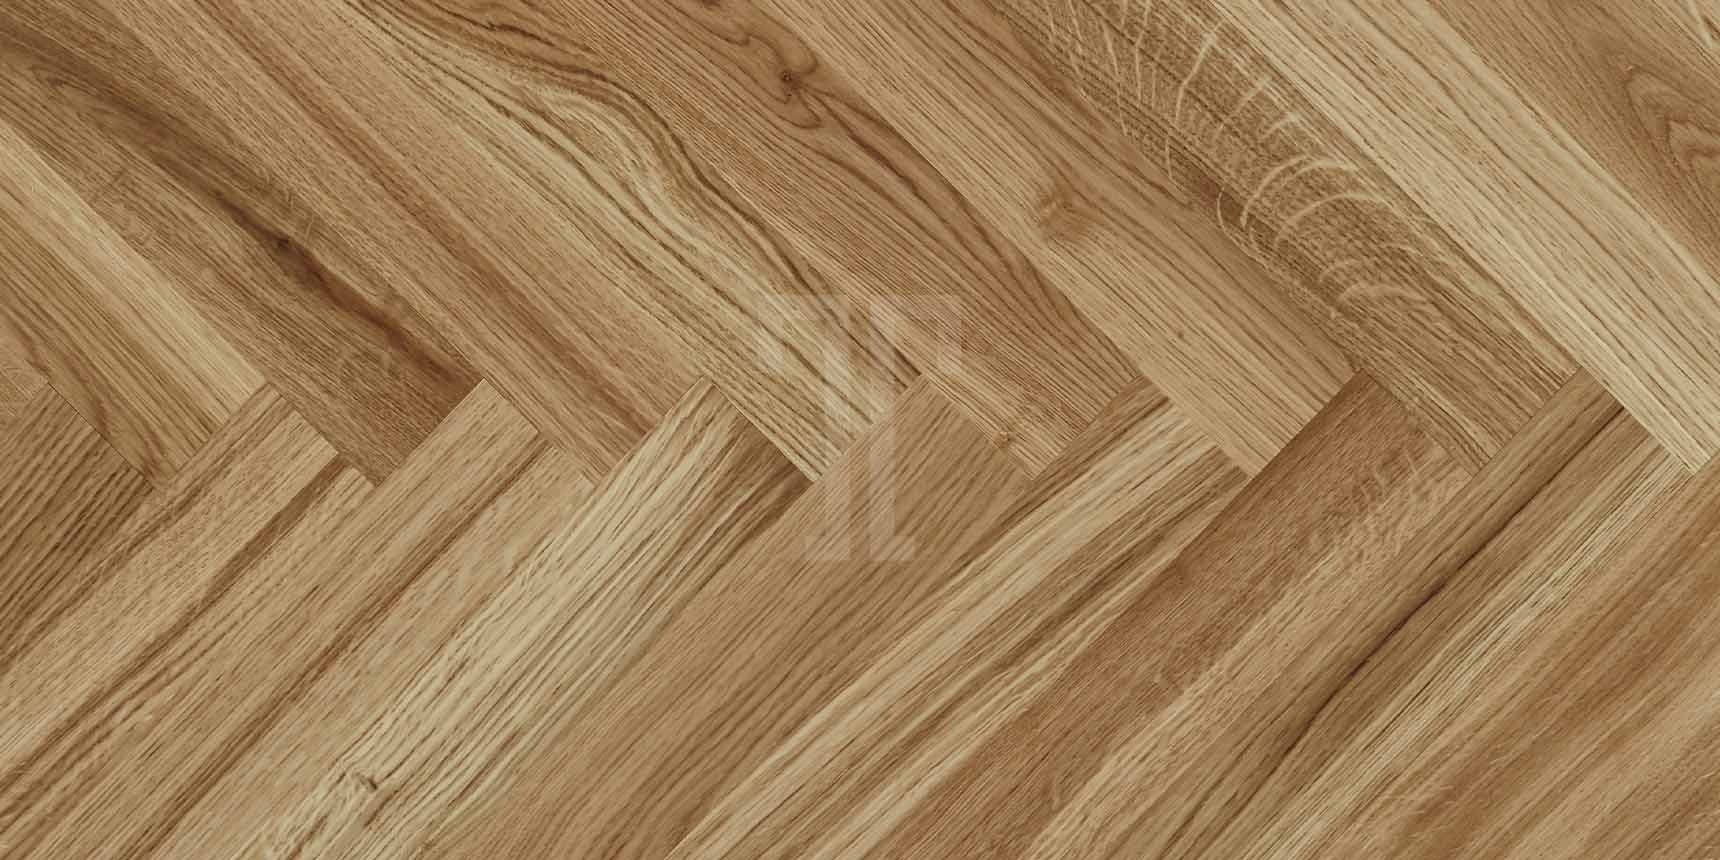 rostrevor herringbone wood flooring, patterns and panels collection KKDMXDA